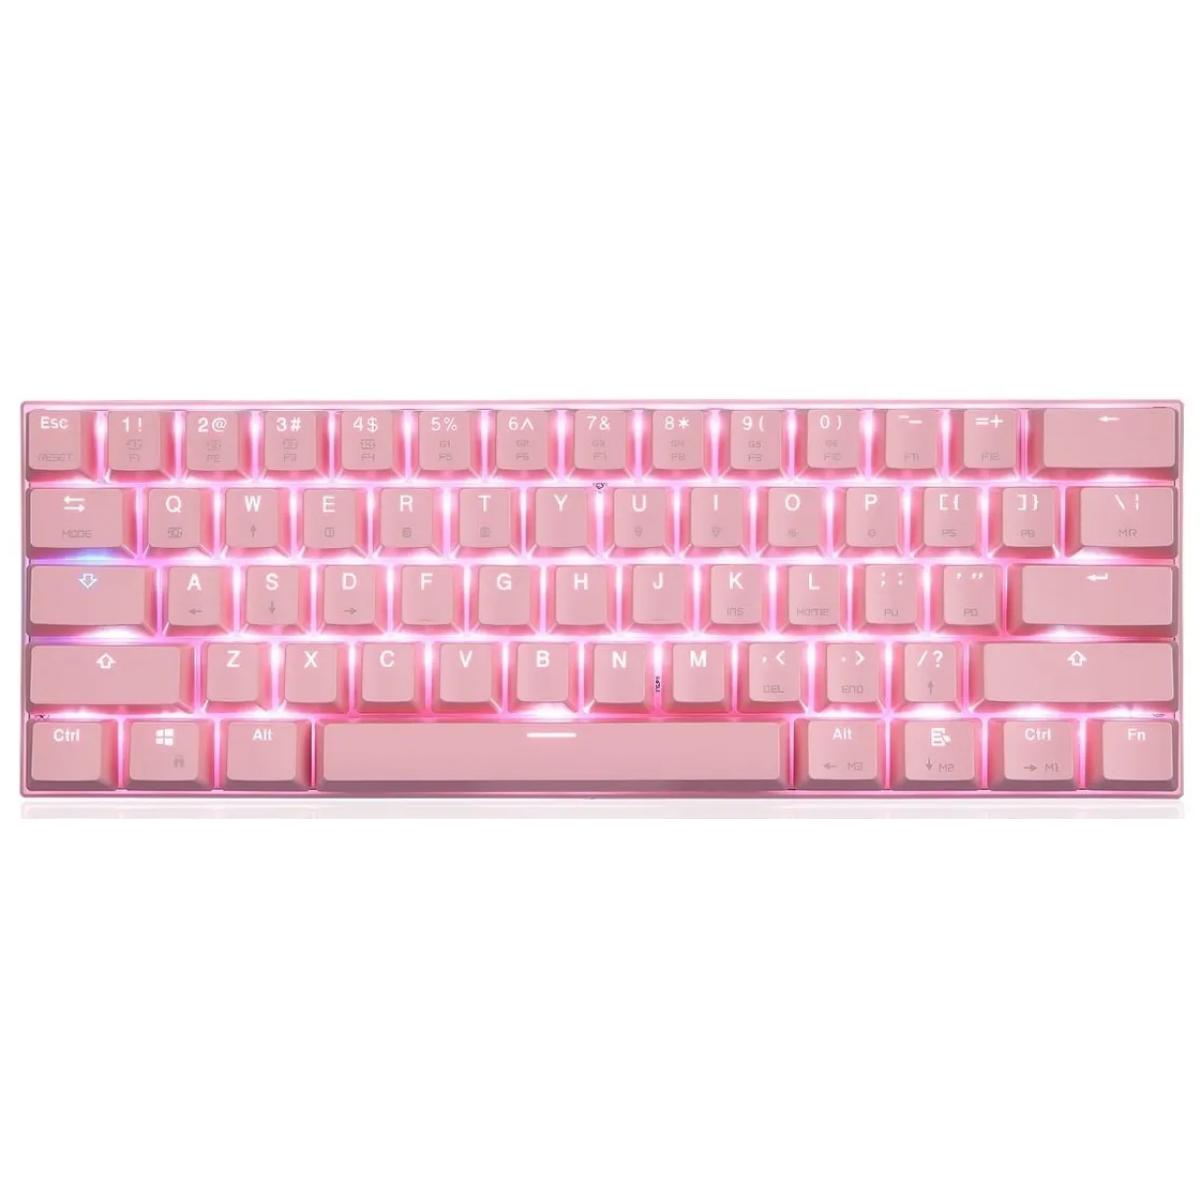 Teclado Gamer Mecânico MotoSpeed CK62 Pink, Switch Blue, RGB, FMSTC0097RSA